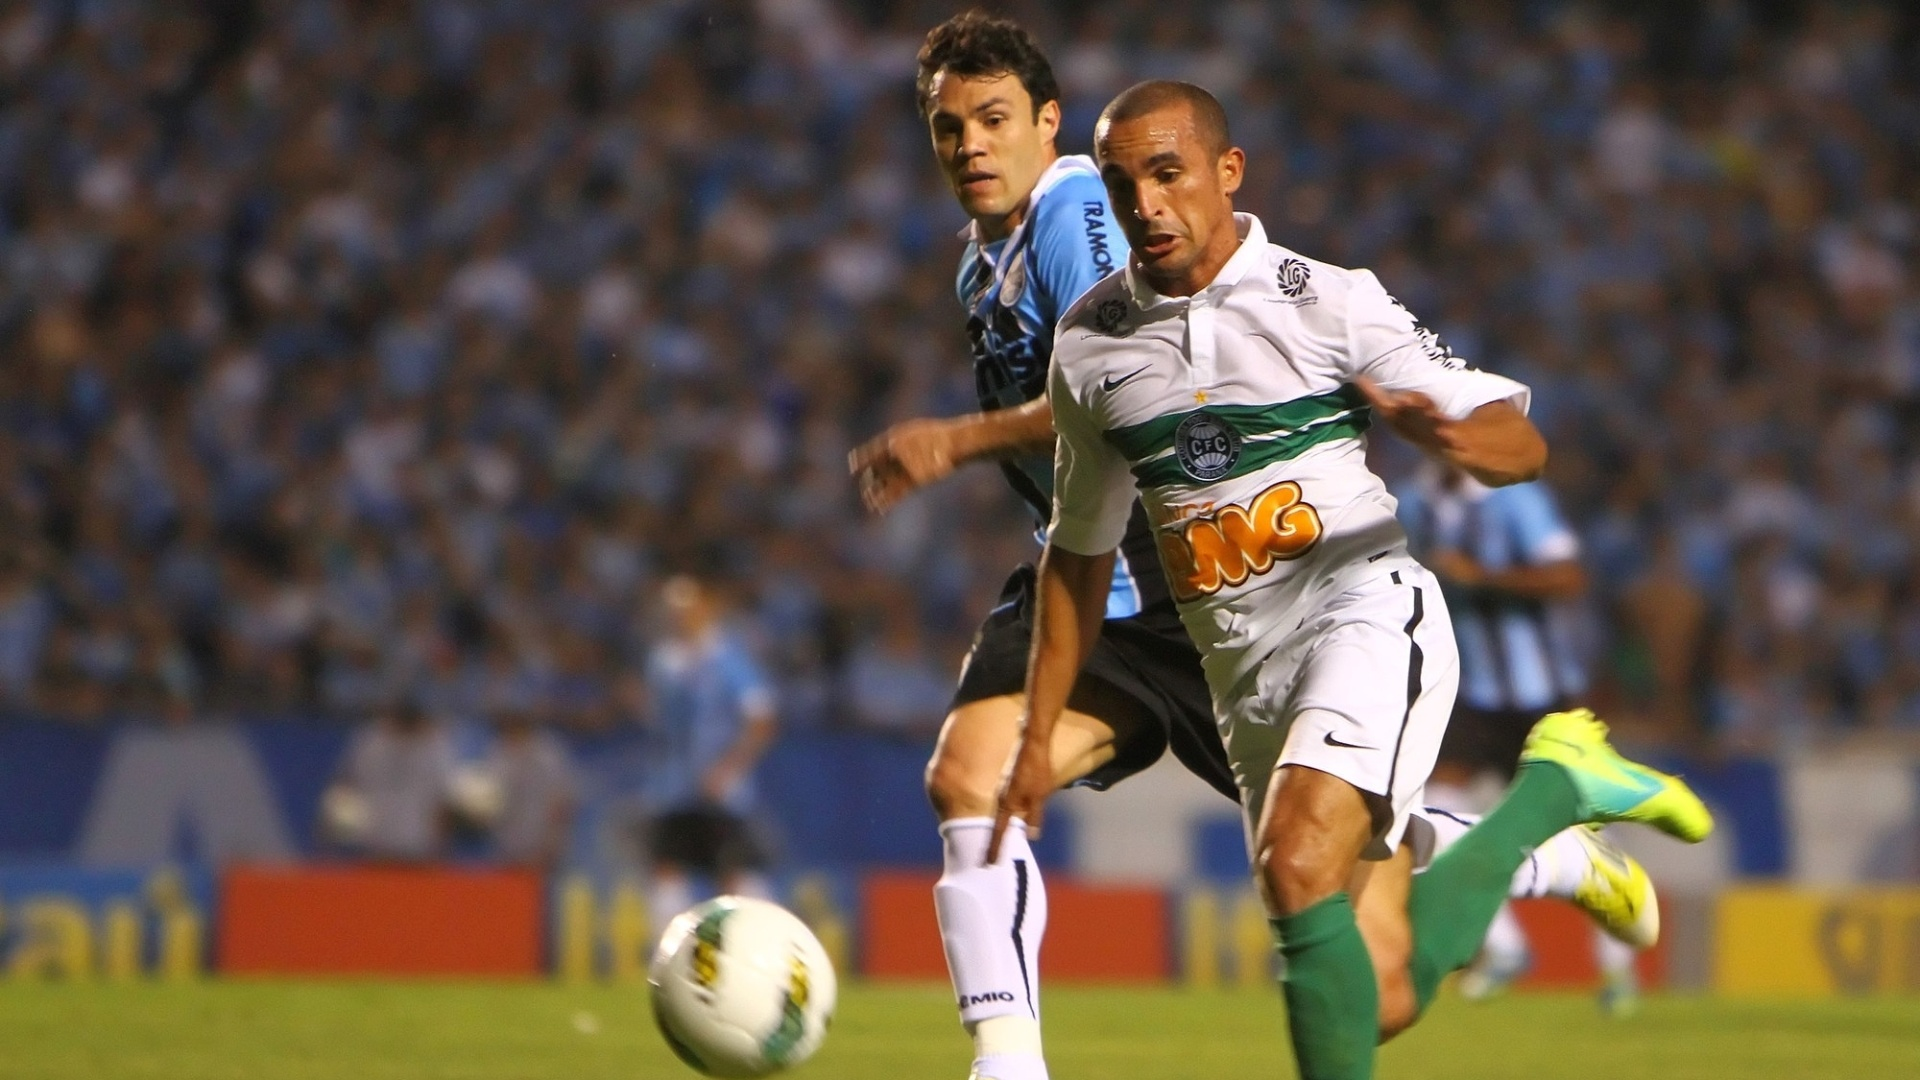 Kleber persegue jogador do Coritiba durante jogo no Olímpico, pela 32ª rodada do Brasileiro